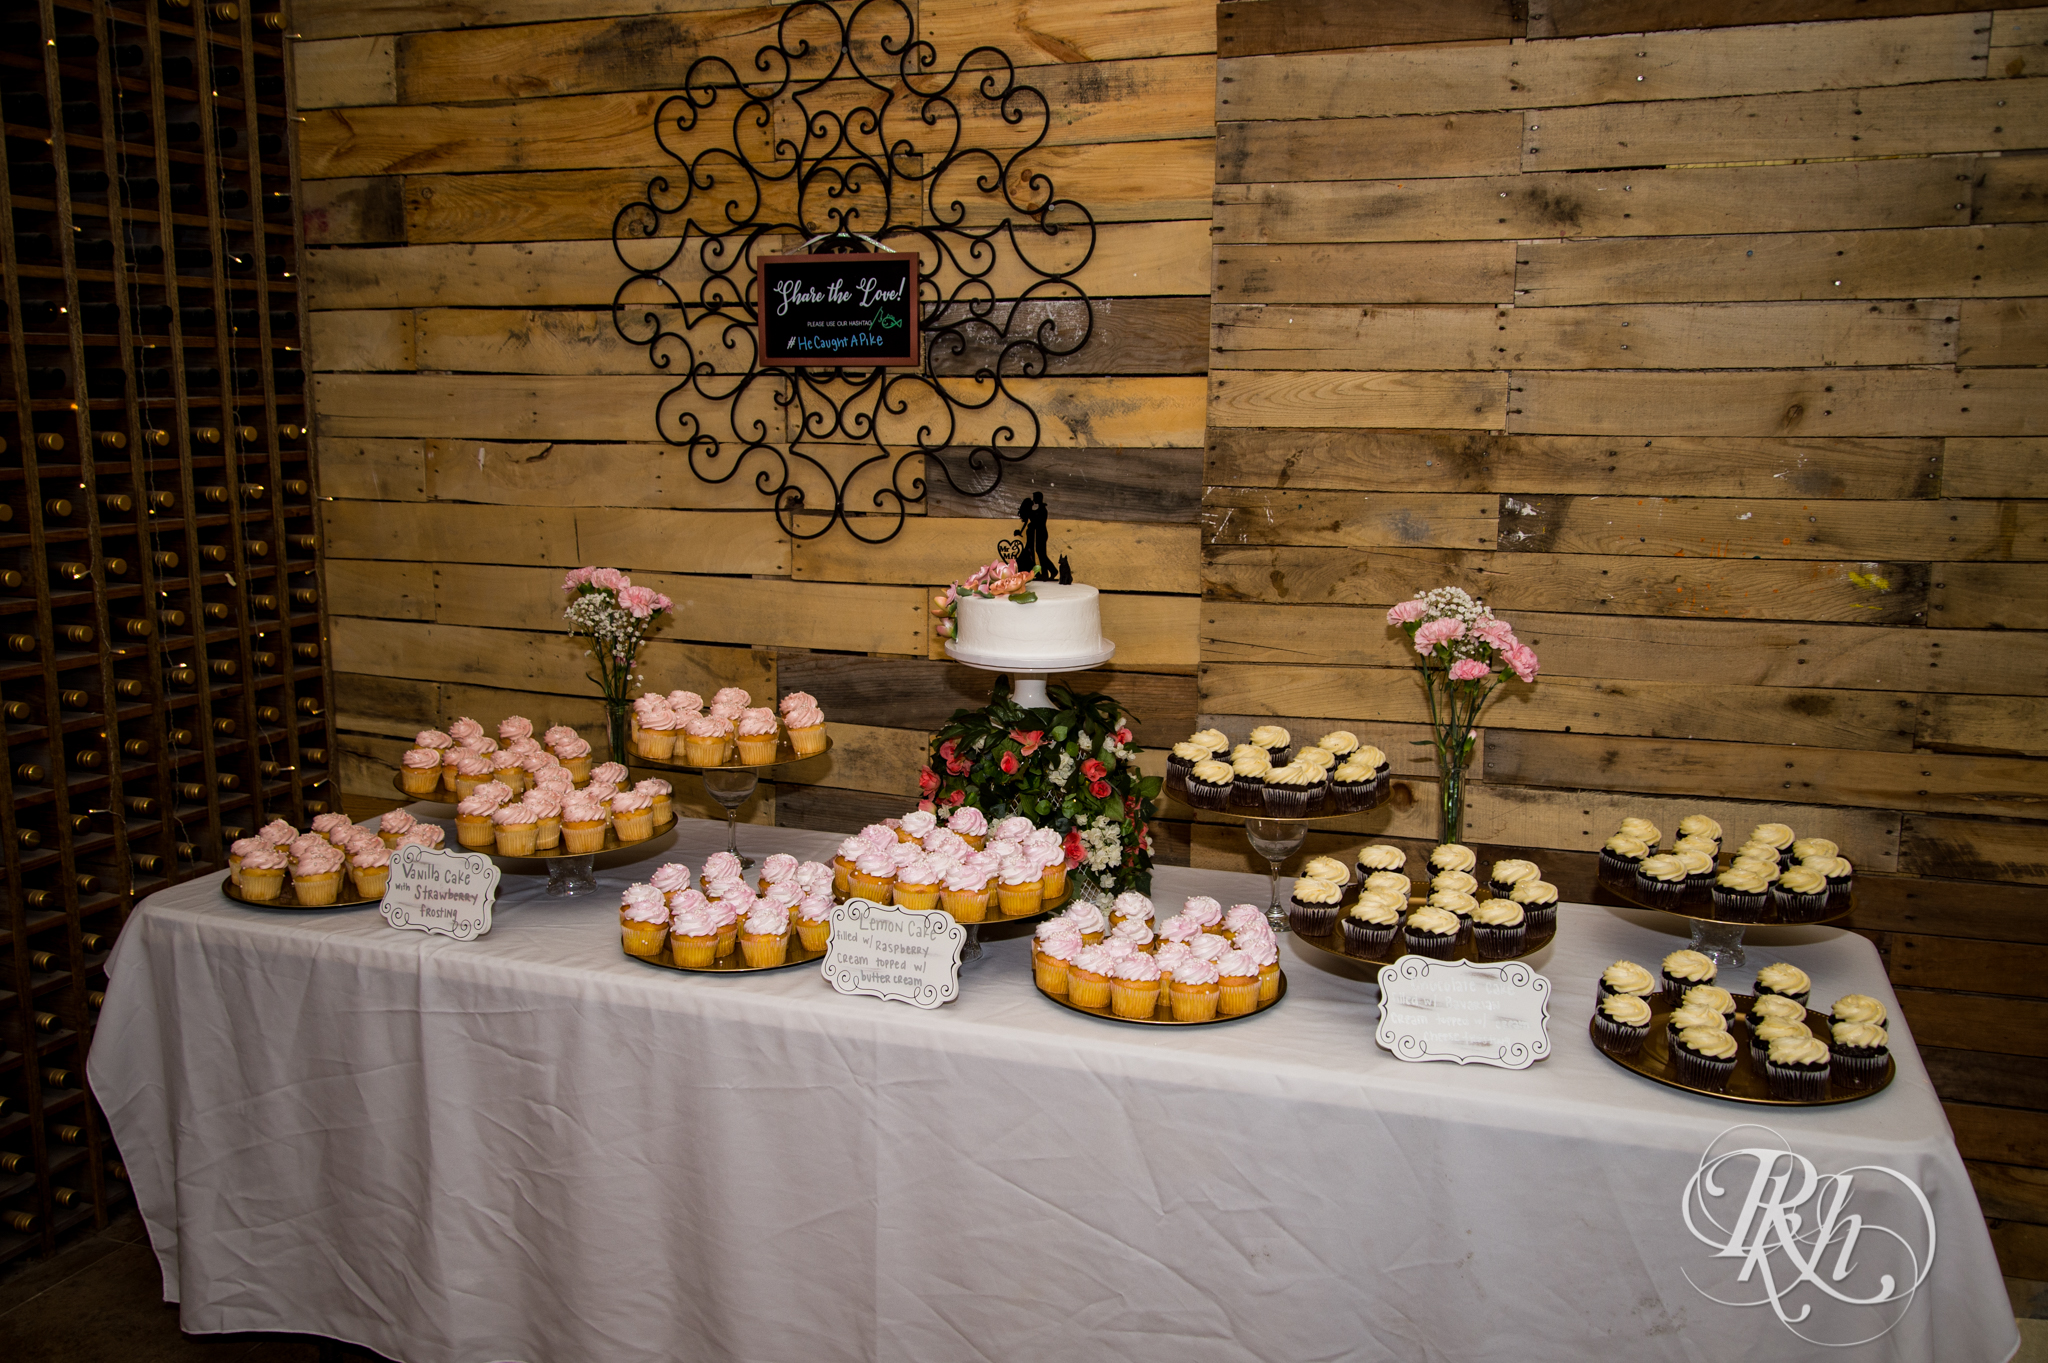 Ally & Nick - Minnesota Wedding Photography - Next Chapter Winery - RKH Images - Blog (12 of 57).jpg